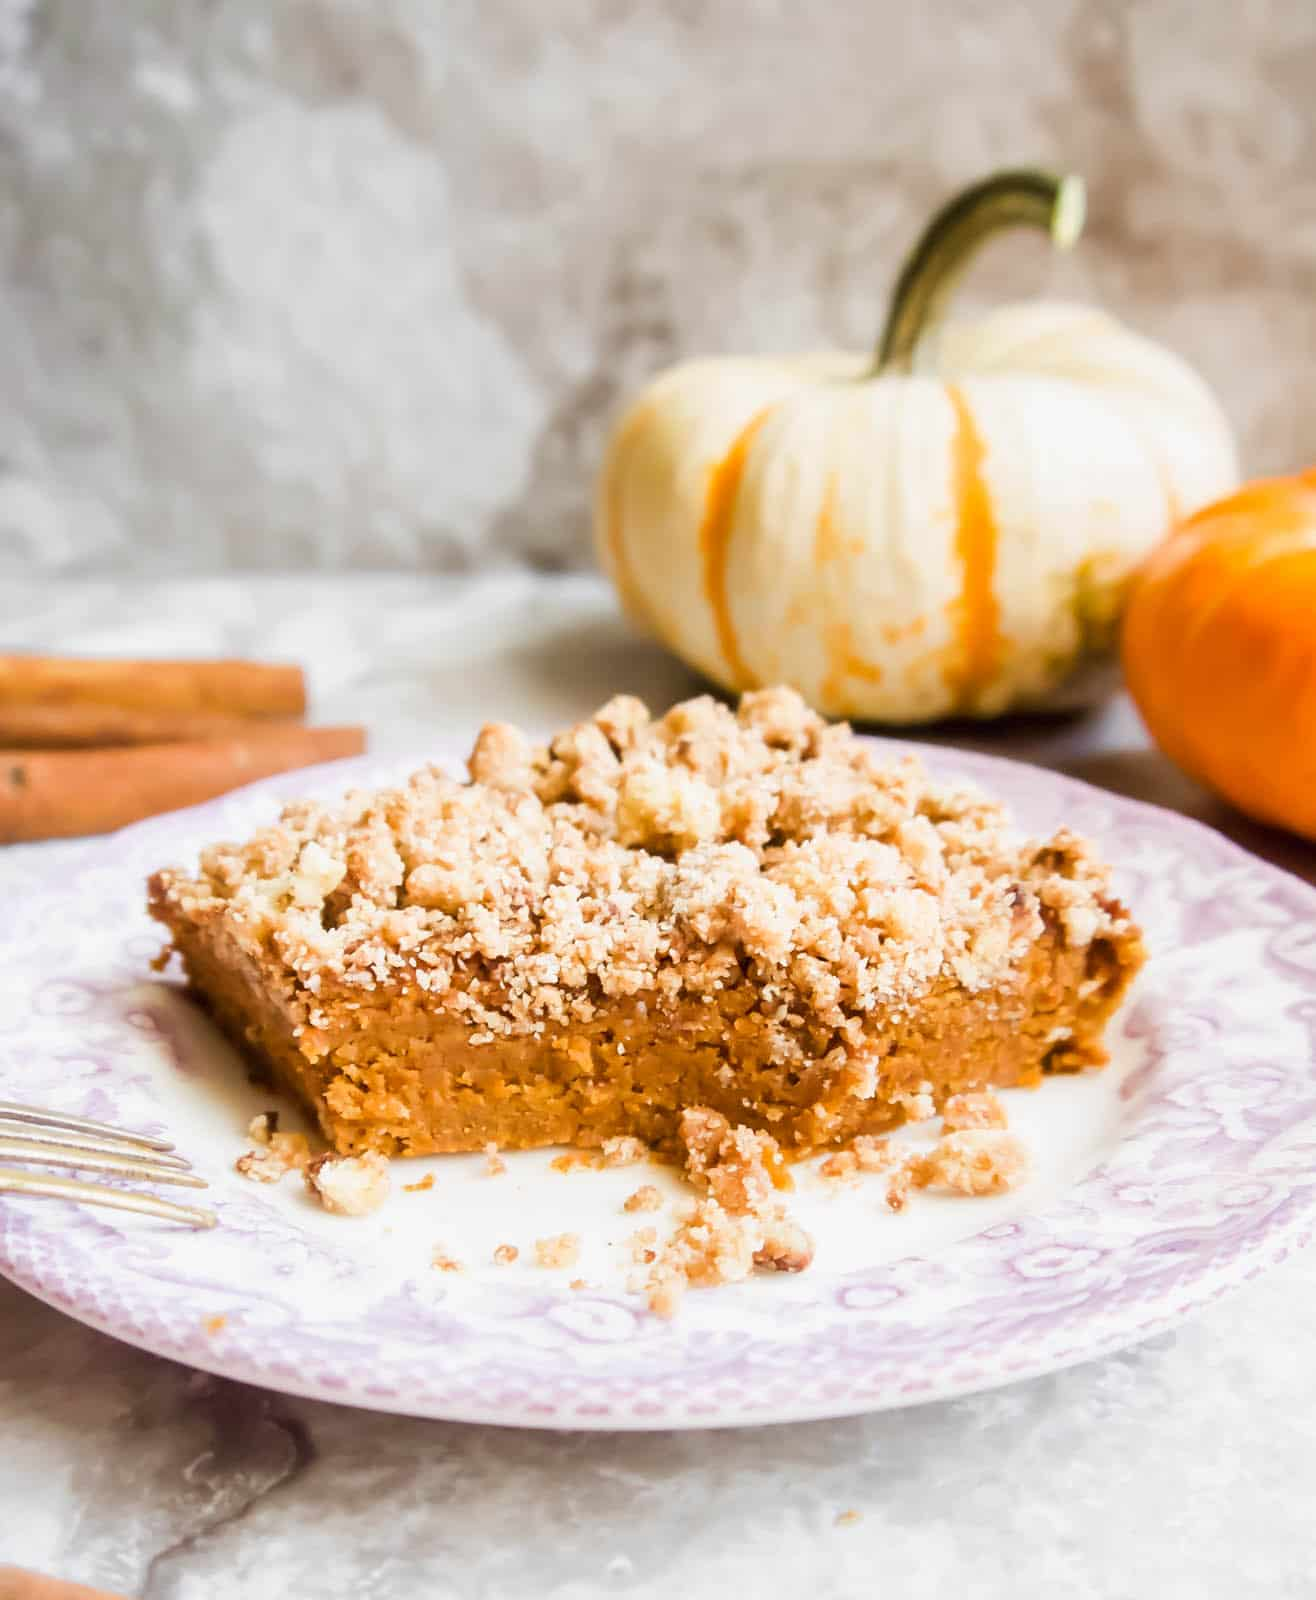 Paleo Gluten Free Pumpkin Coffee Cake